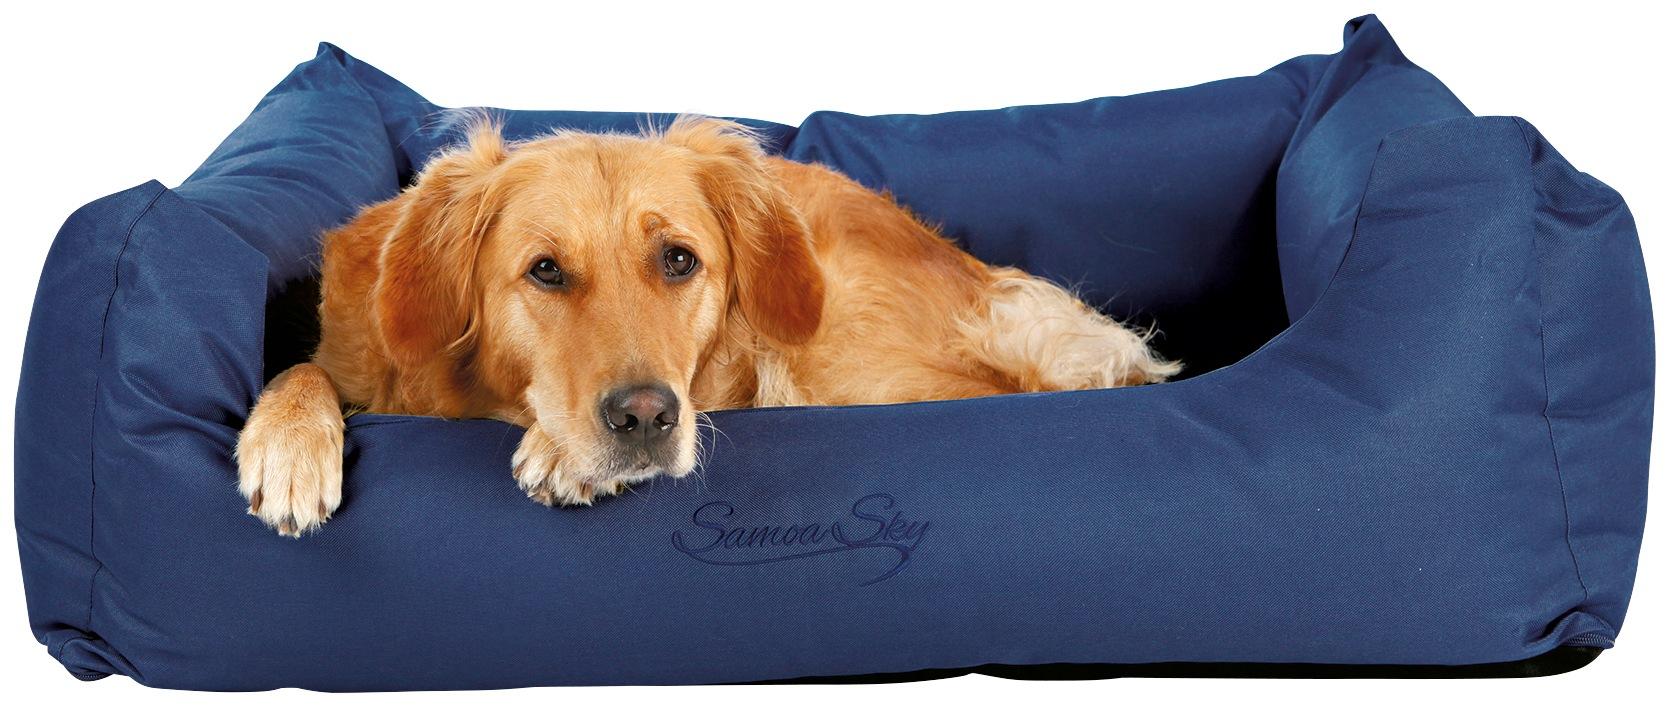 TRIXIE Hundebett »Samoa Sky«, BxL: 100x80 cm, blau | Garten > Tiermöbel > Hundekörbe-Hundebetten | Blau | Polyester | TRIXIE